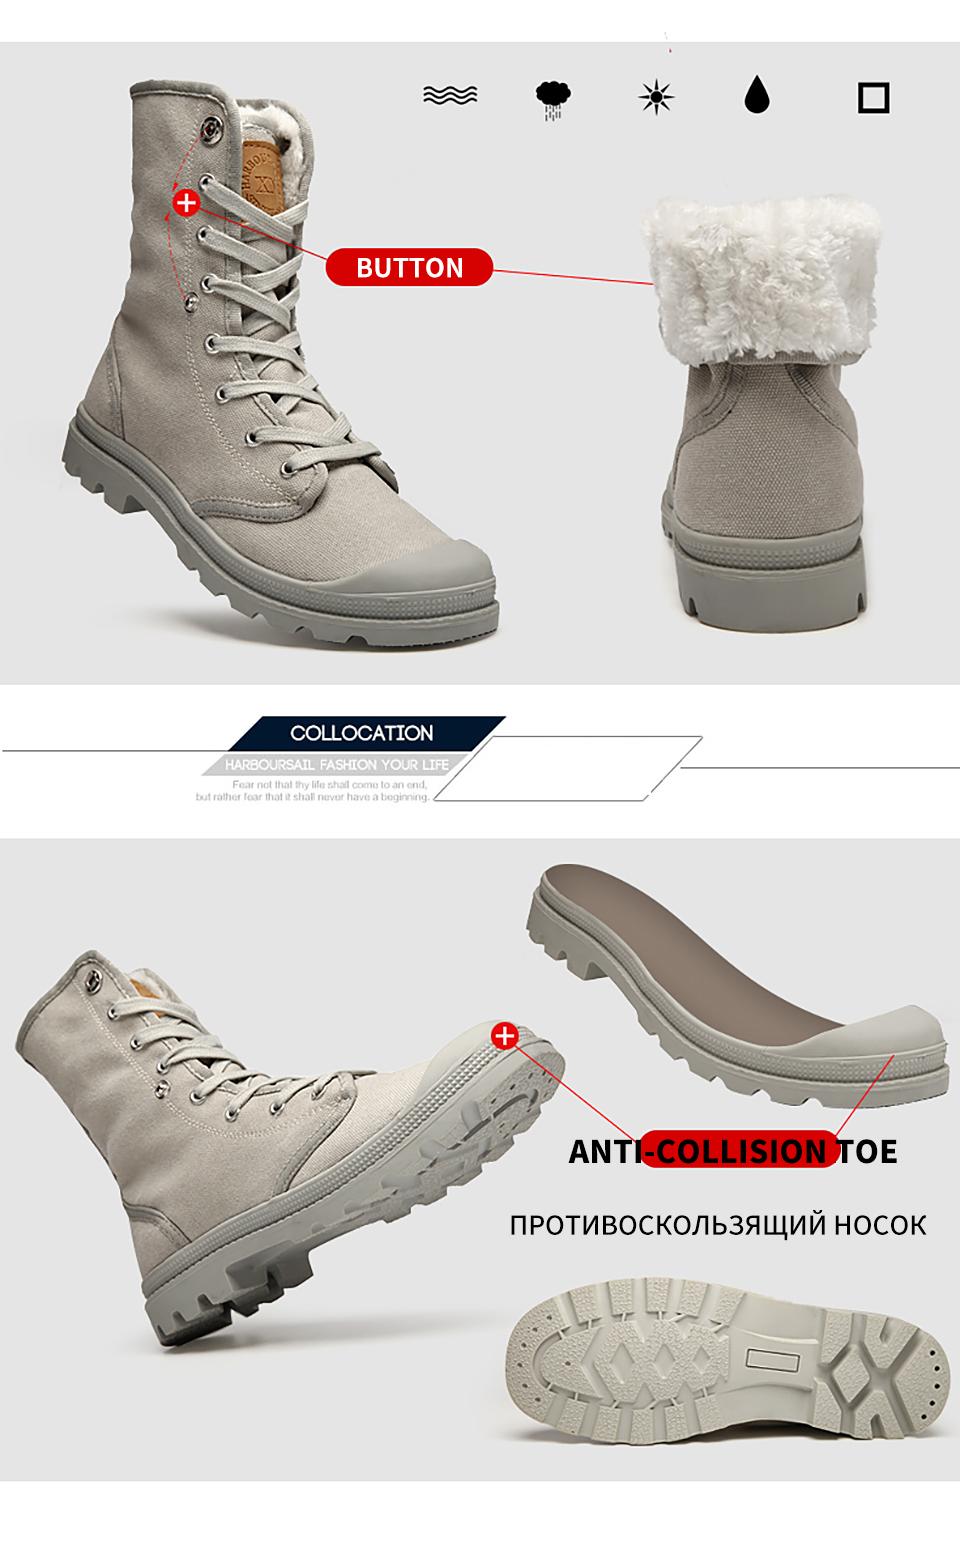 Kualitas Musim Gugur Dingin Pria Kanvas Sepatu Fashion Hangat Pantofel Grey Cadilac 295 Cm